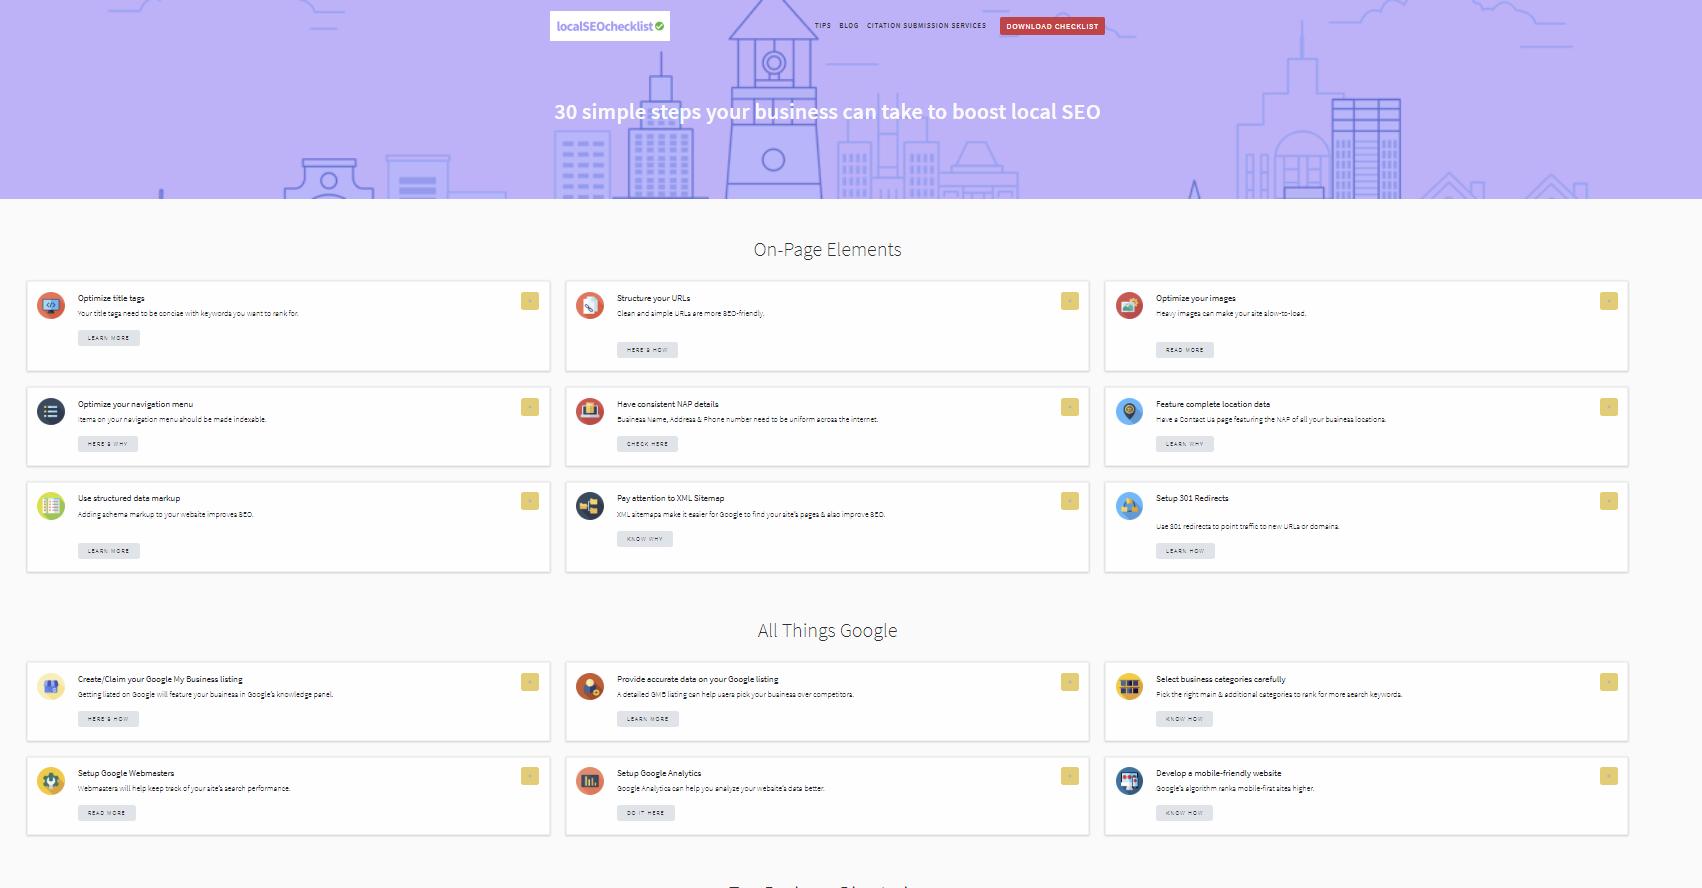 Free SEO Tools local seo checklist